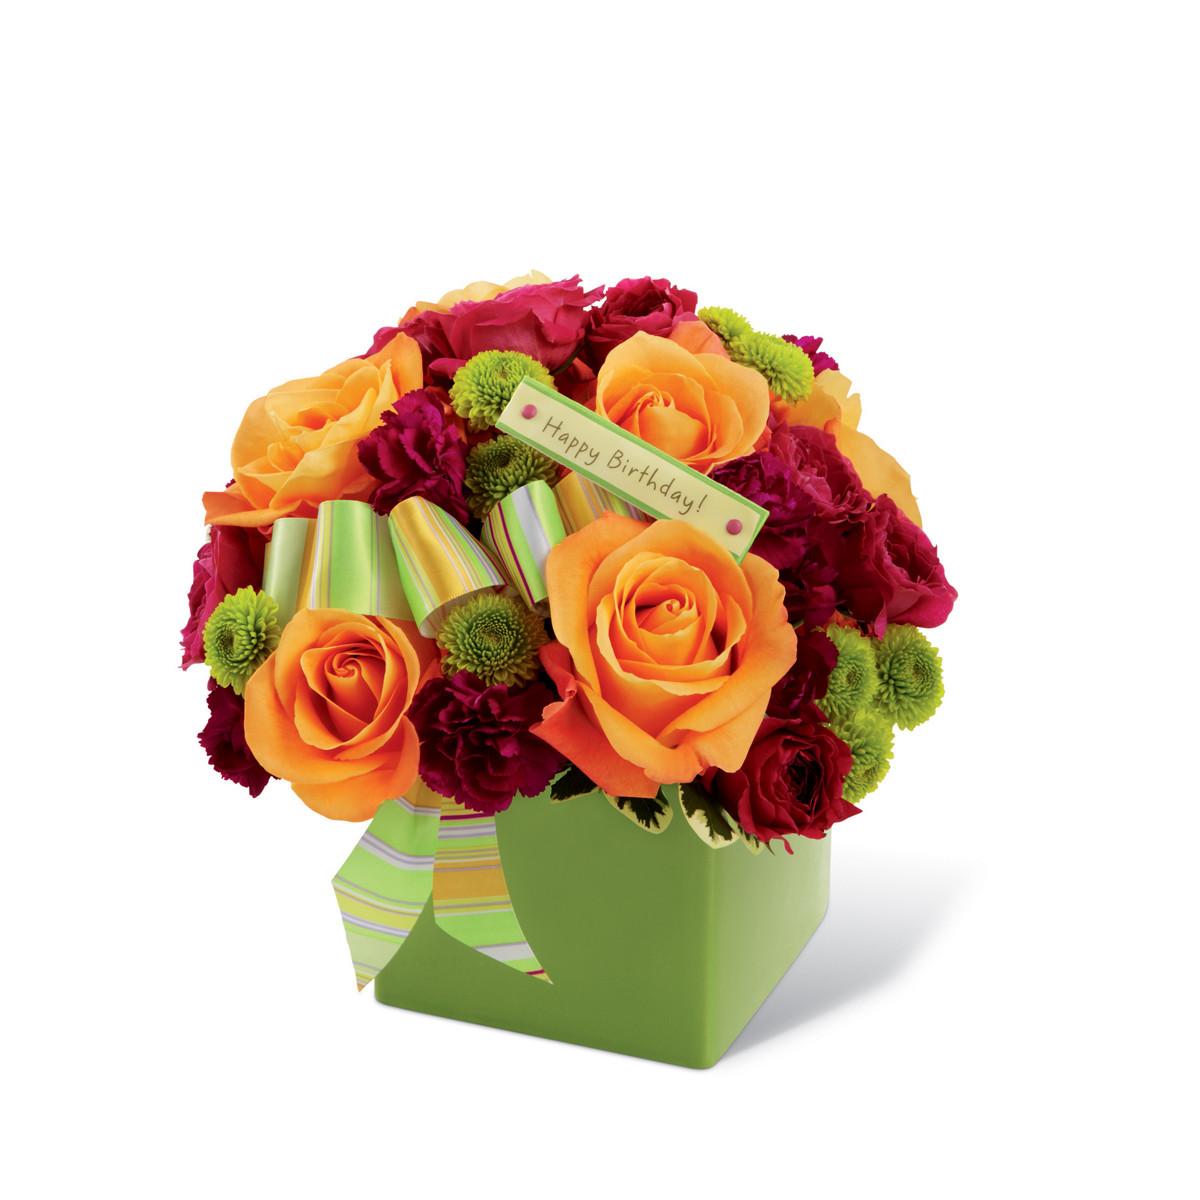 The FTD Birthday Bouquet Urbandale IA Florist